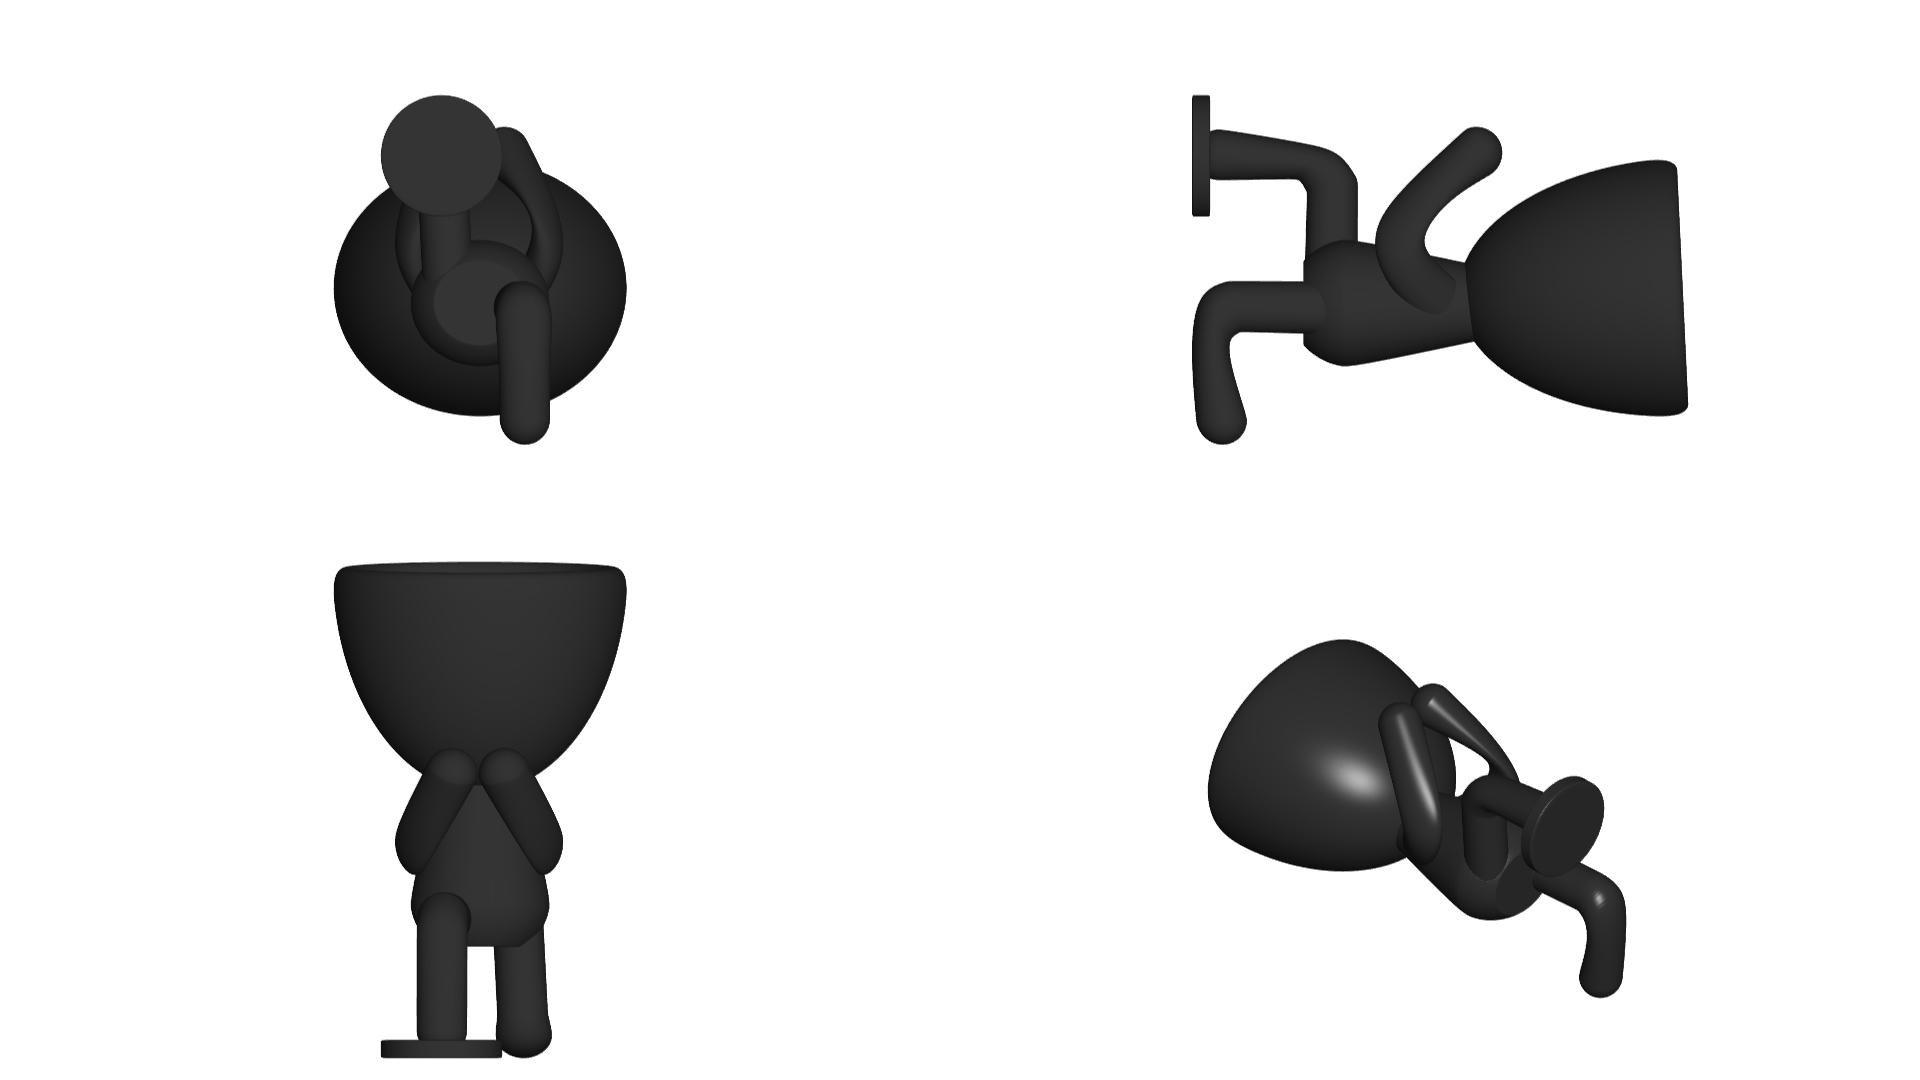 Vaso_08_Negro_2.jpg Télécharger fichier STL gratuit JARRÓN MACETA ROBERT 08 - VASE POT DE FLEURS ROBERT 08 • Modèle à imprimer en 3D, CREATIONSISHI